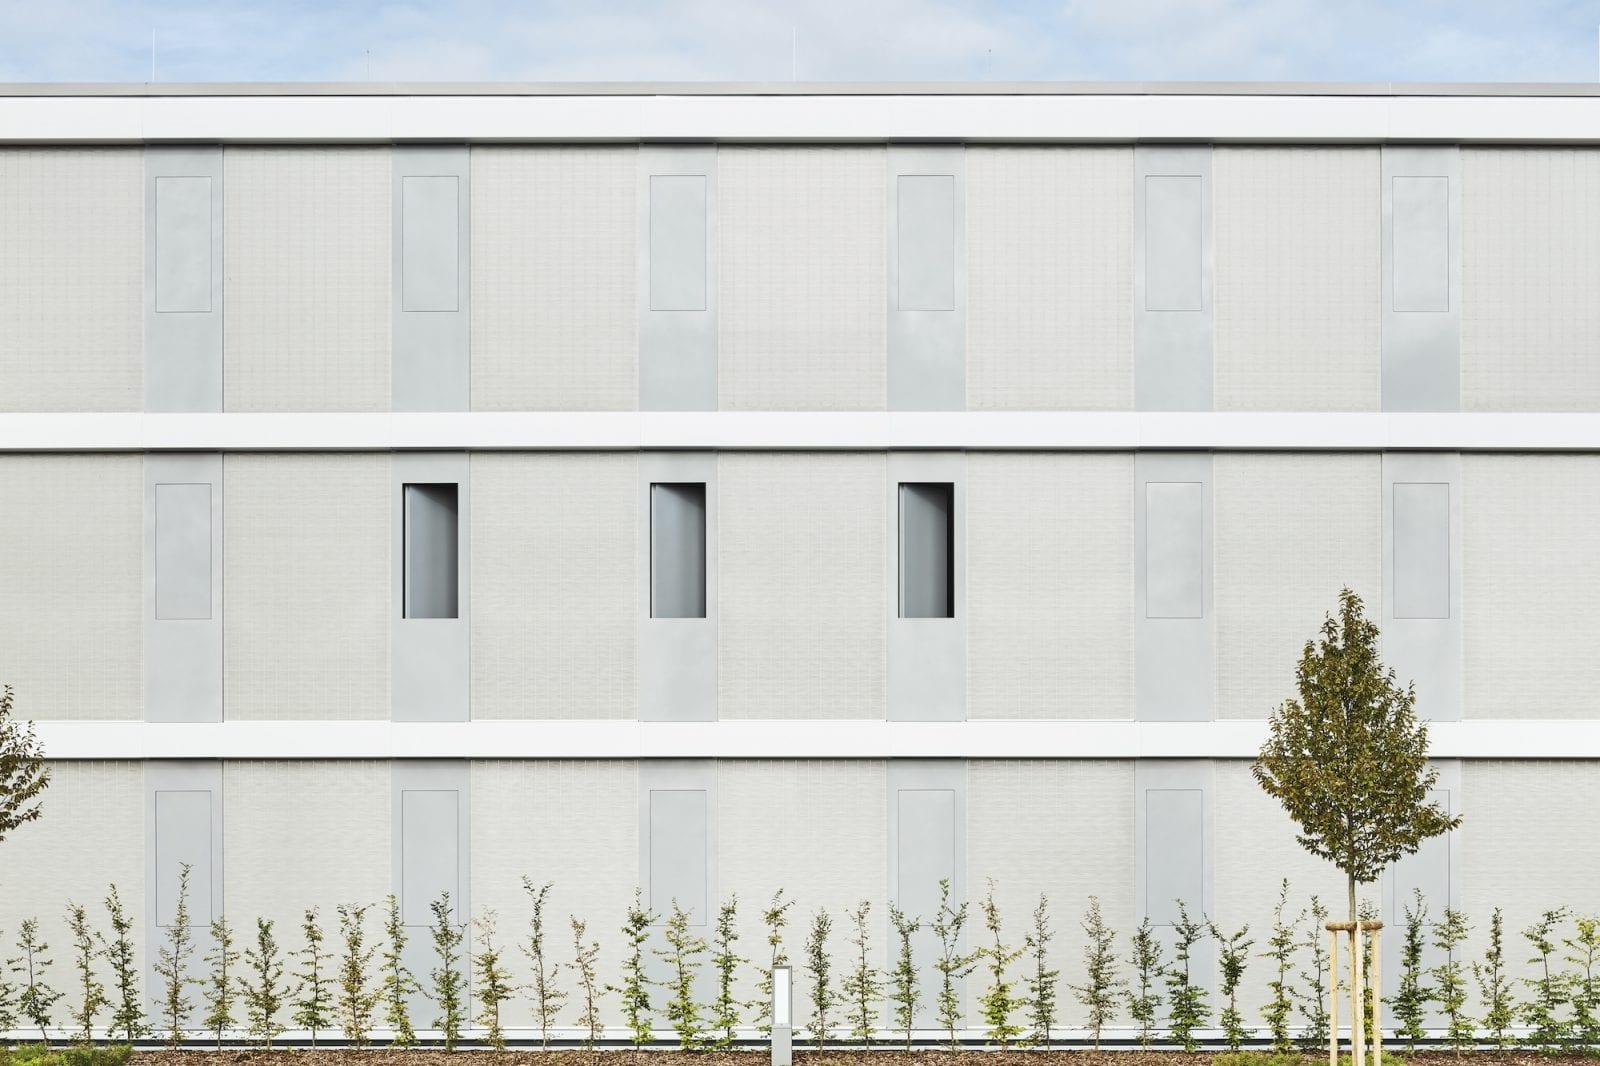 Fassadenansicht Büroriegel im geschlossenen Zustand (Foto: Dietmar Strauss)